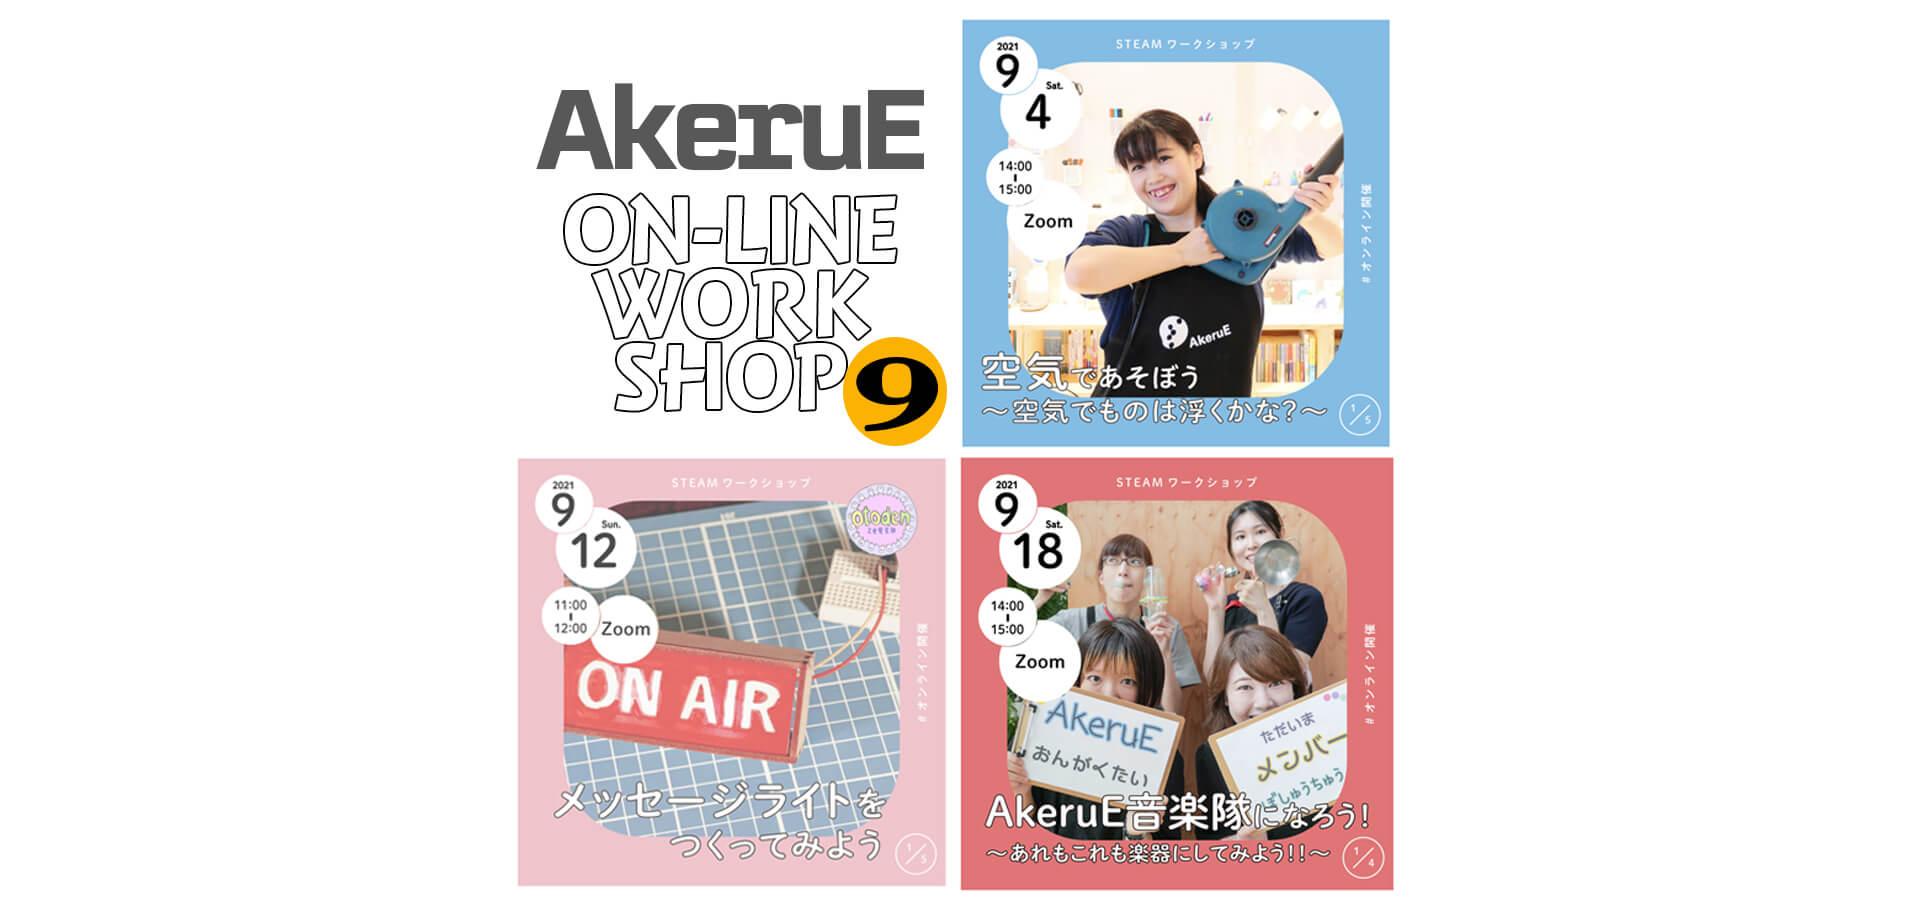 AkeruEオンラインワークショップ